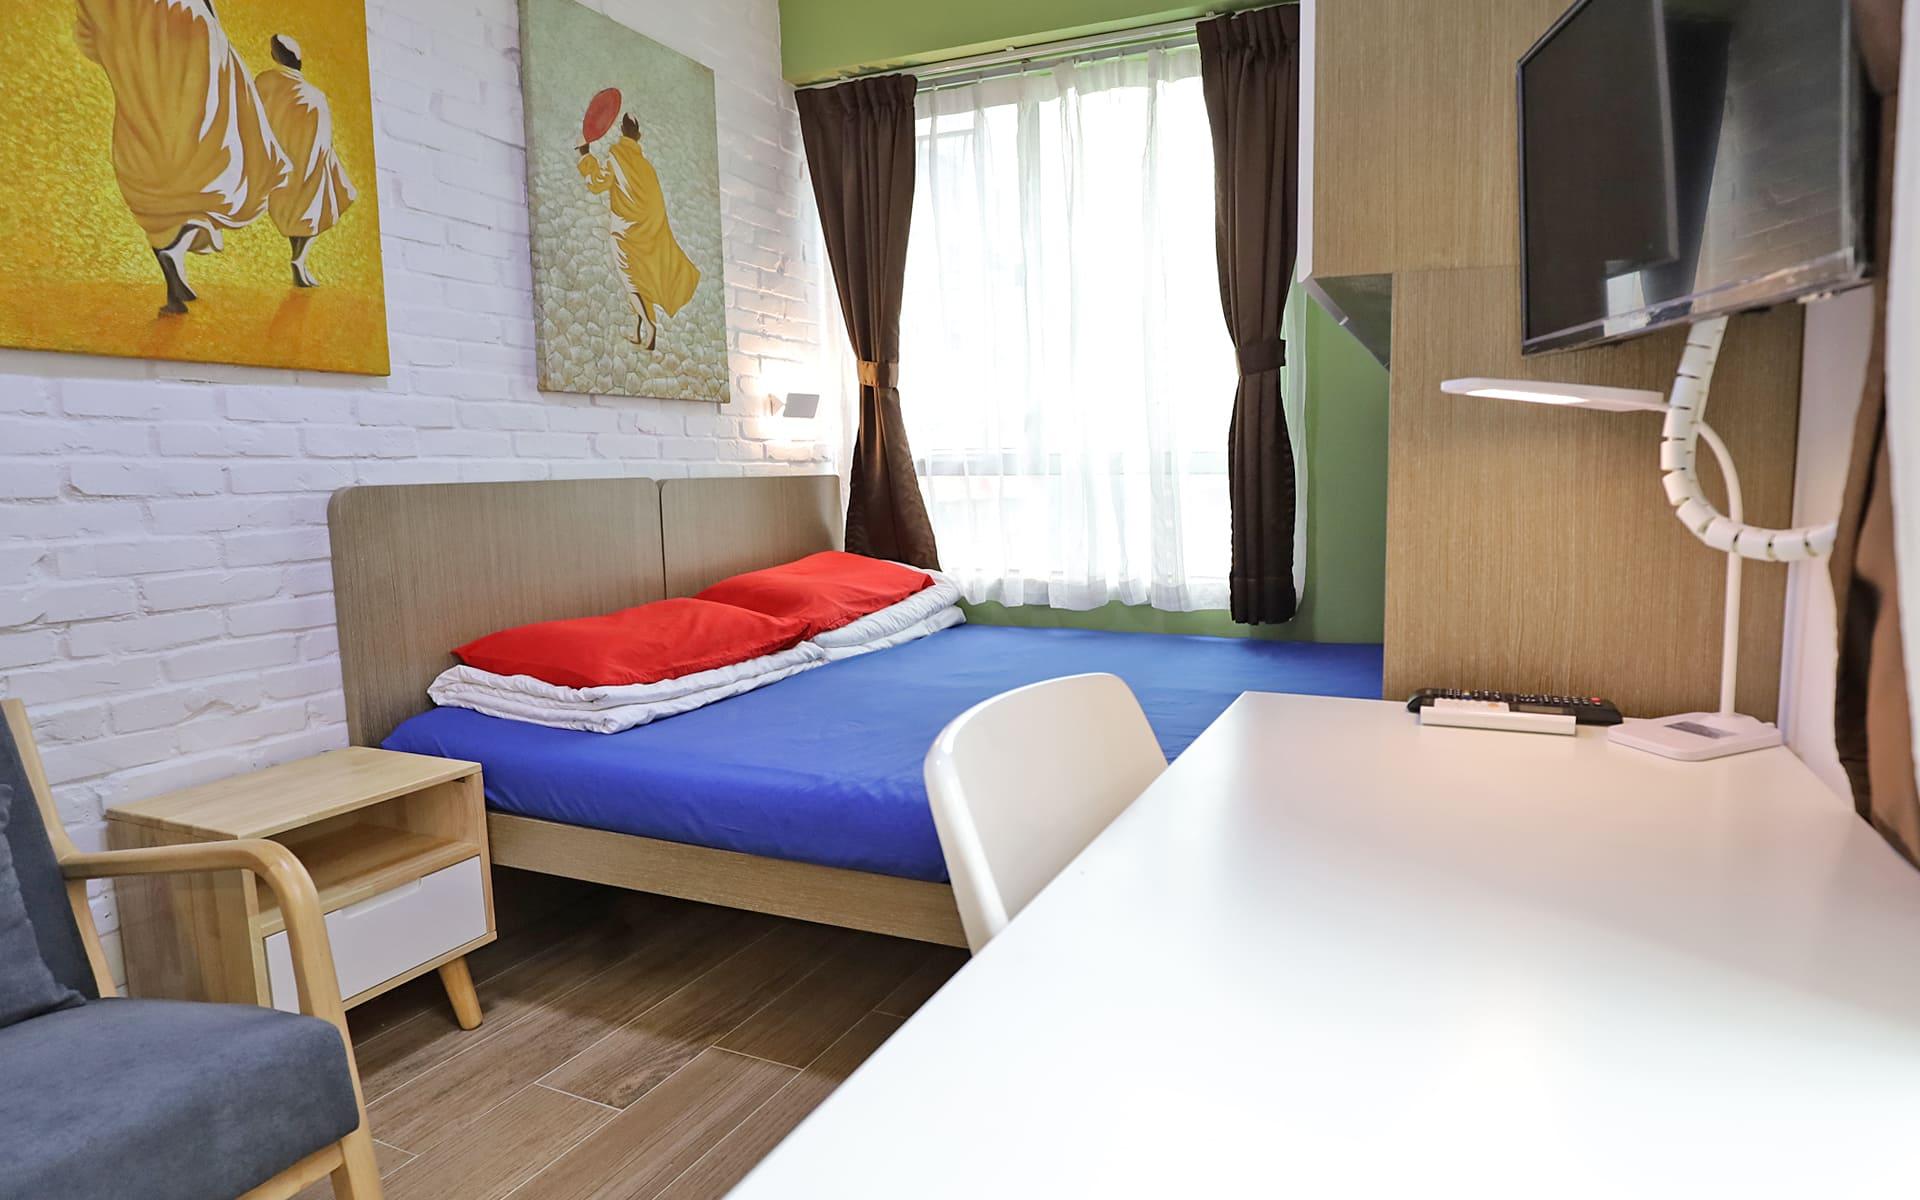 hk_service_apartment_4485393601589362127.jpg